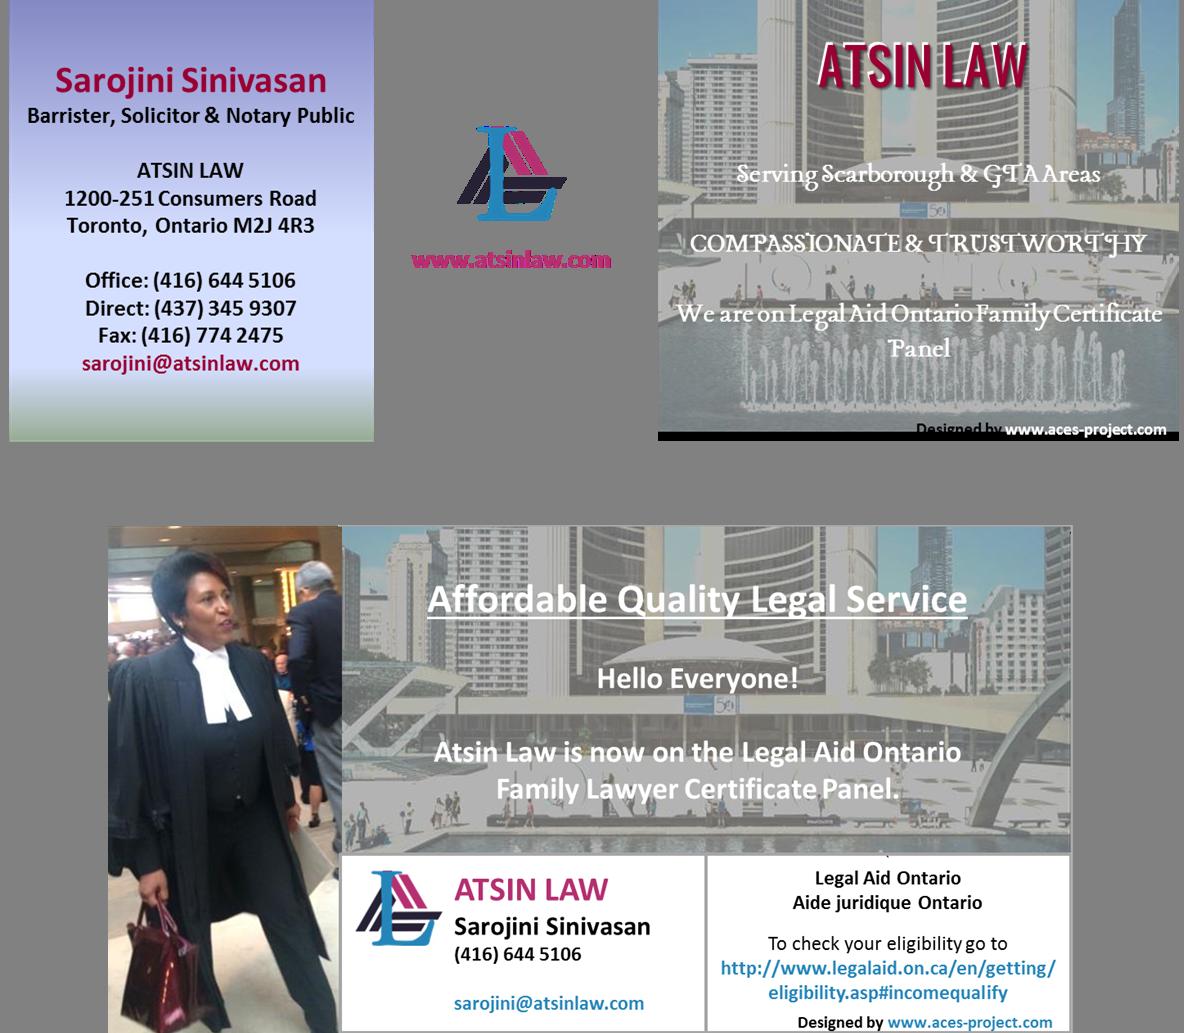 Atsin Law